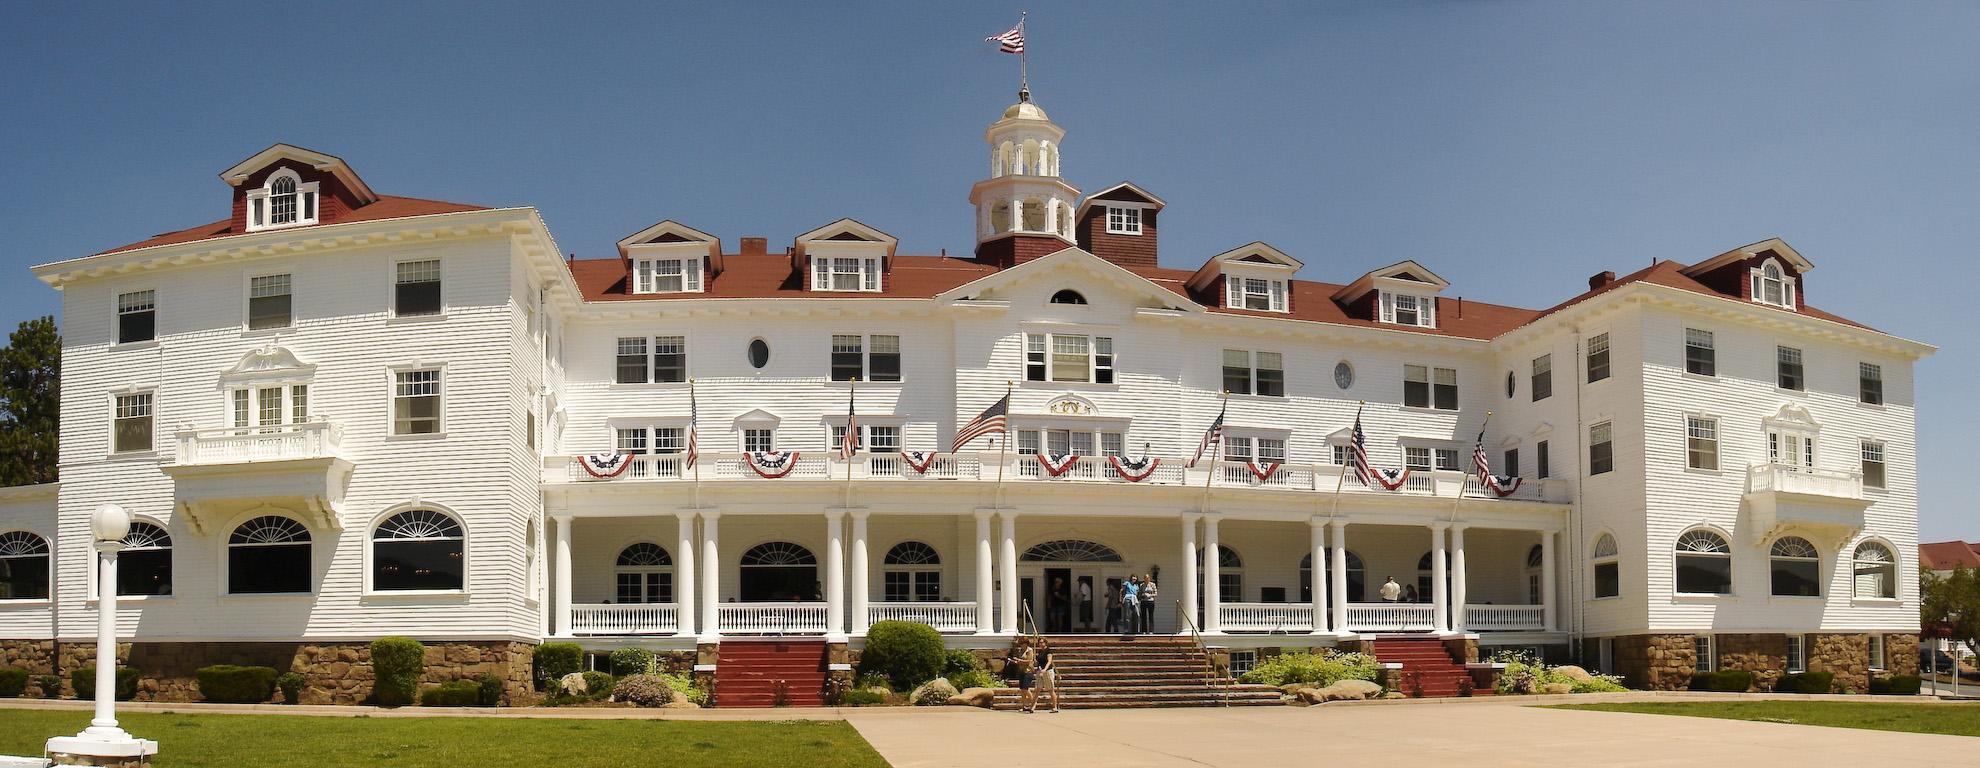 Hotels Near Colorado State Fairgrounds Pueblo